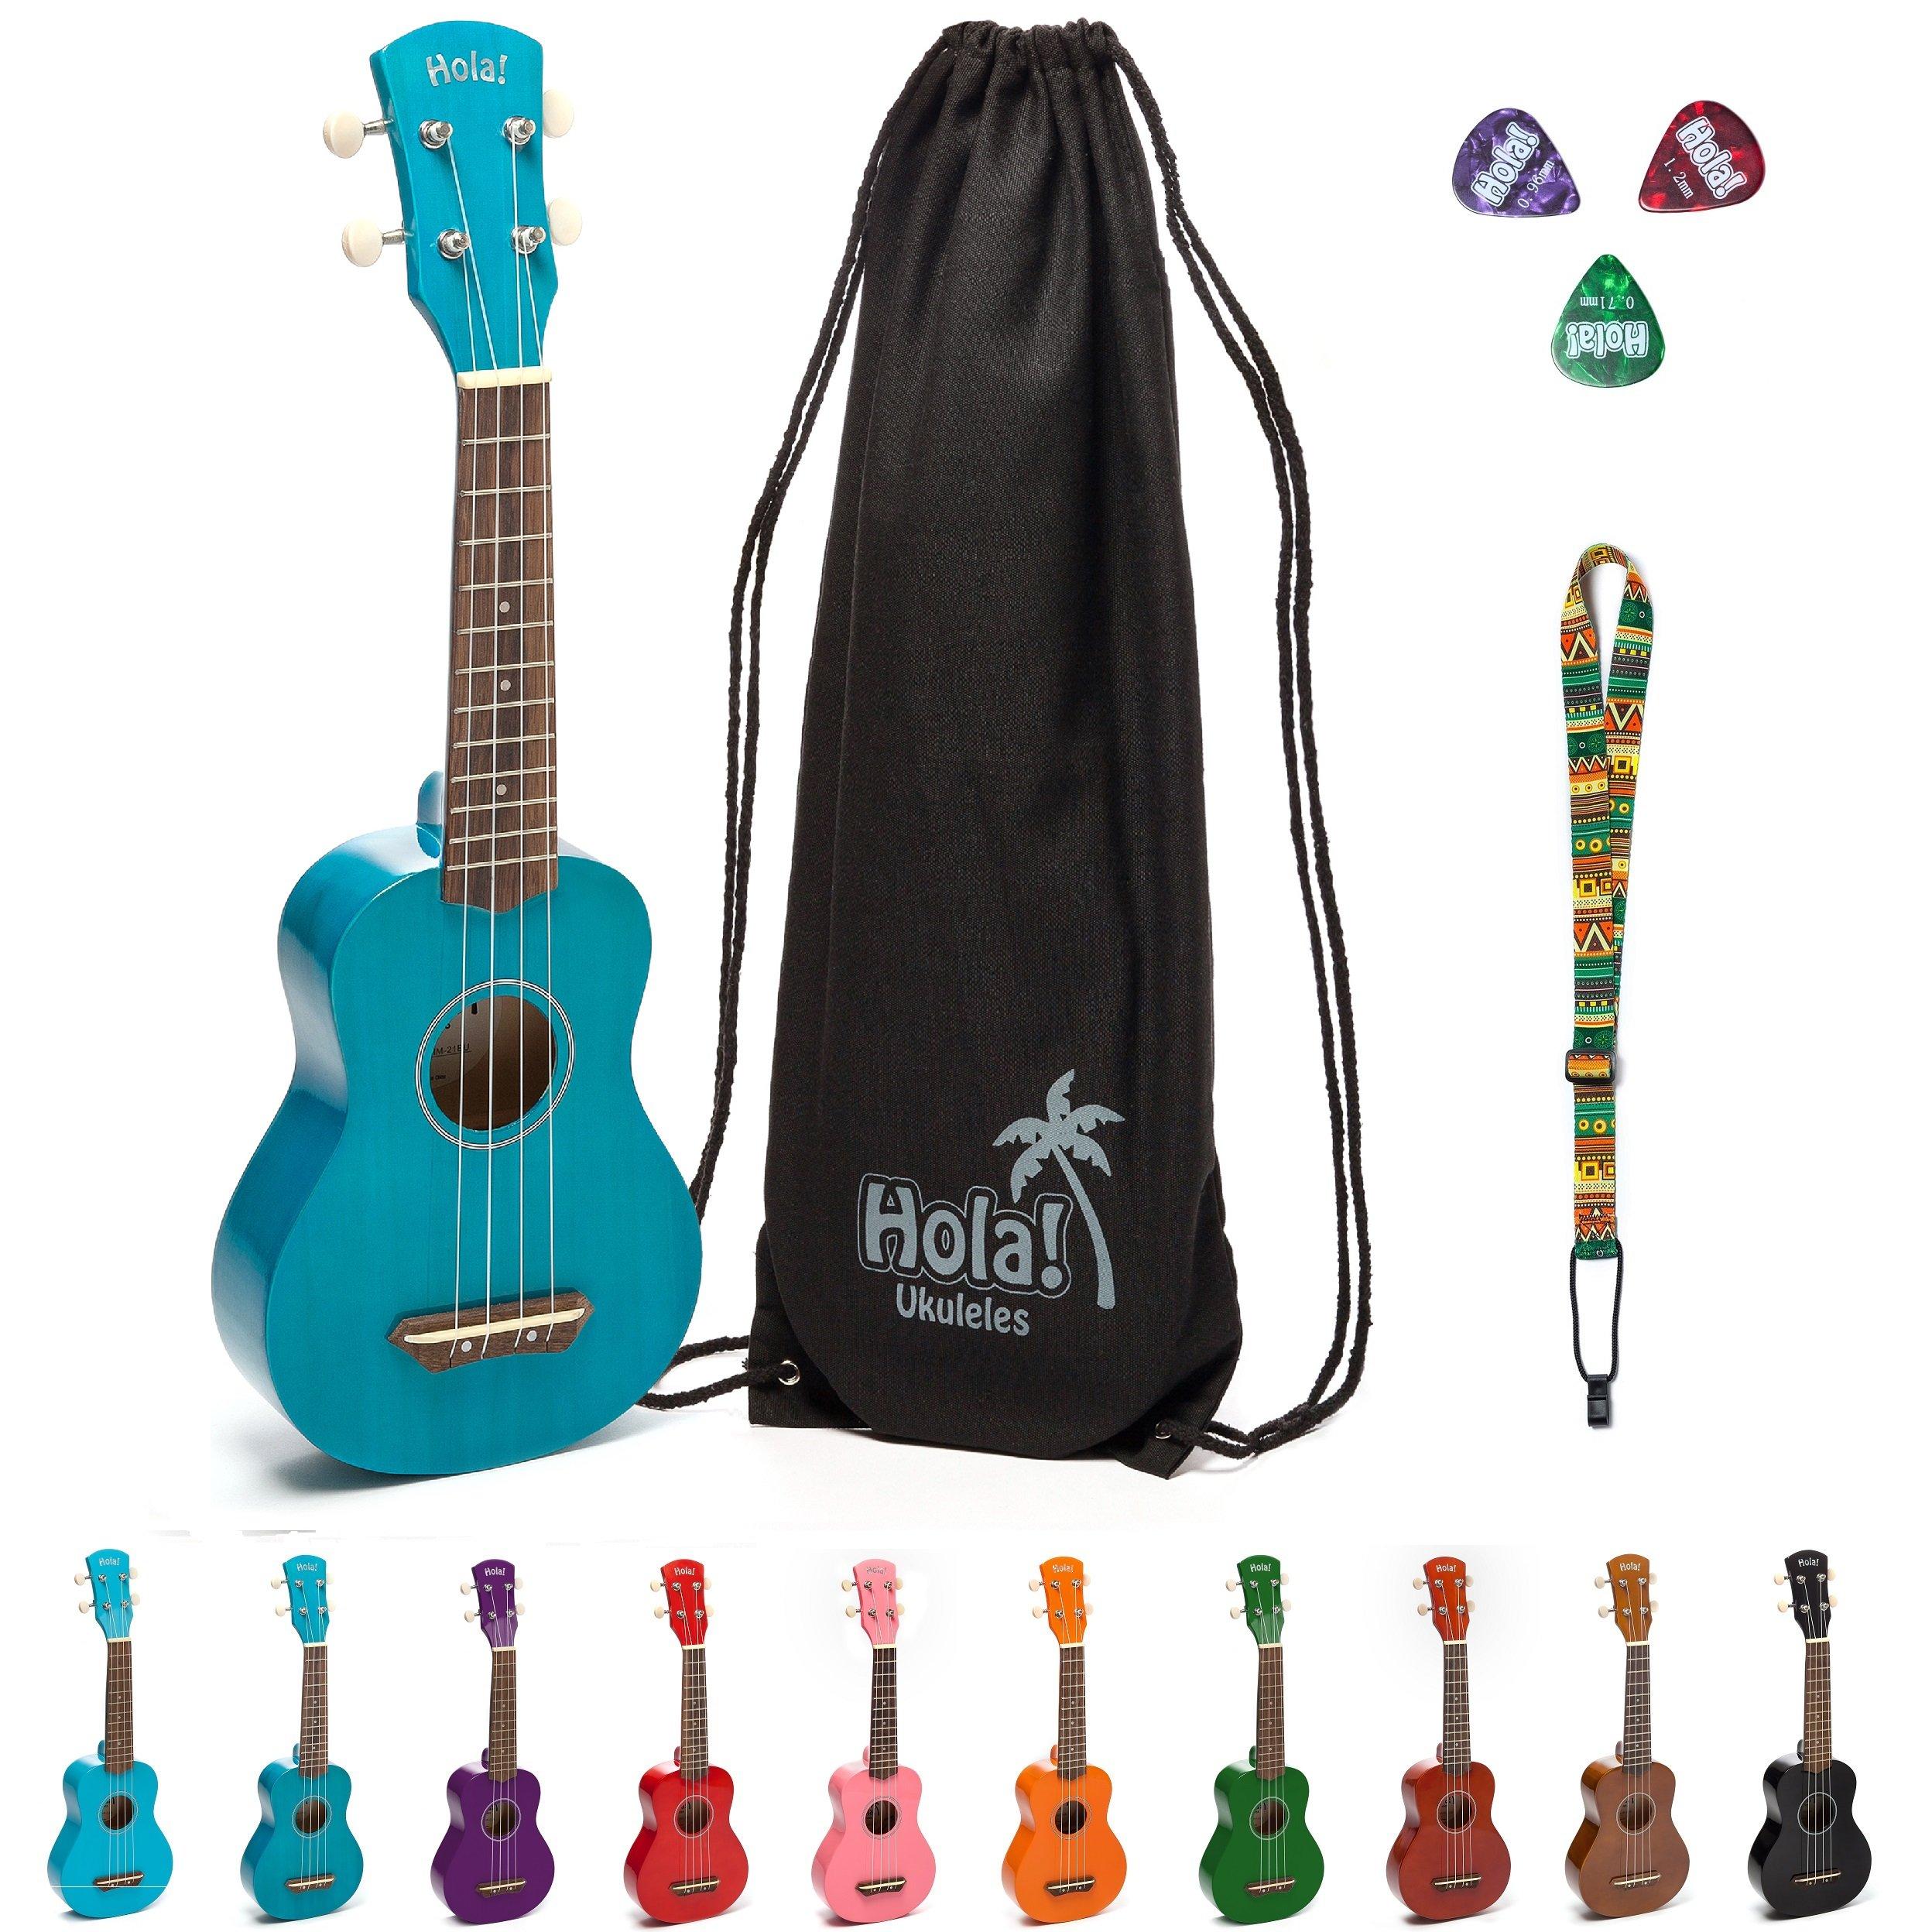 Hola! Music HM-21BU Soprano Ukulele Bundle with Canvas Tote Bag, Strap and Picks, Color Series - Blue